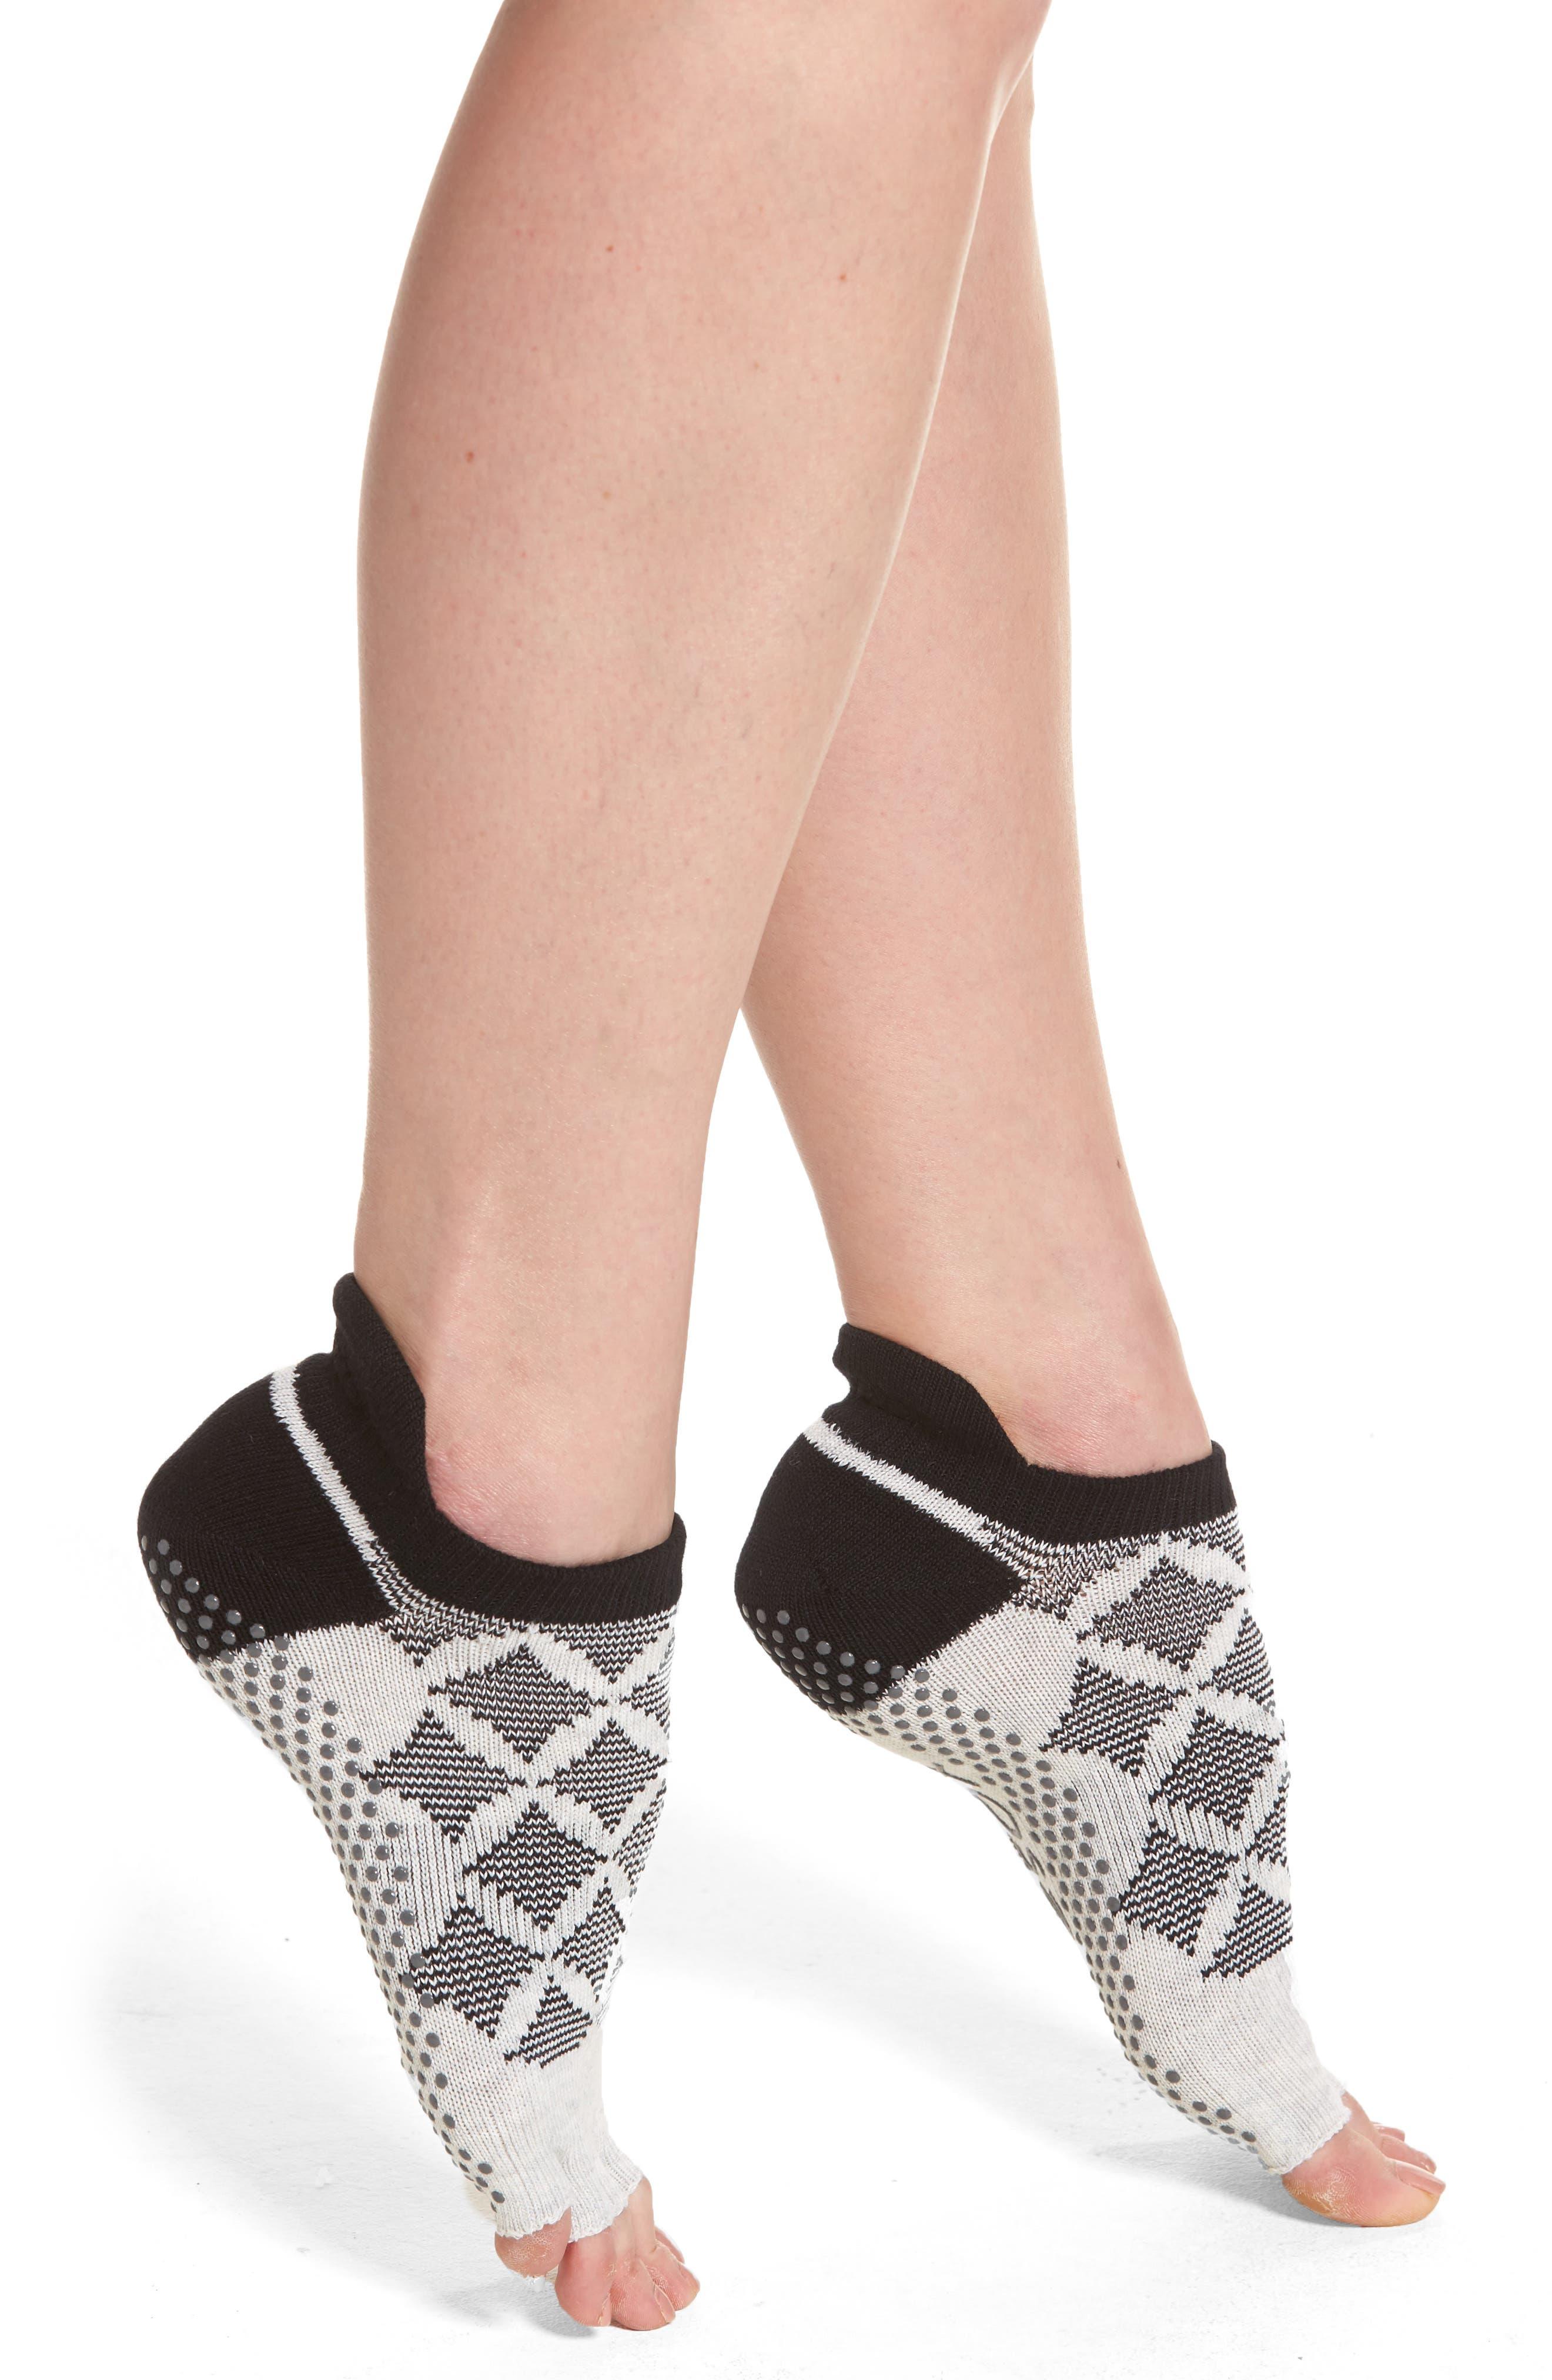 Low Rise Half Toe Gripper Socks,                             Main thumbnail 1, color,                             001